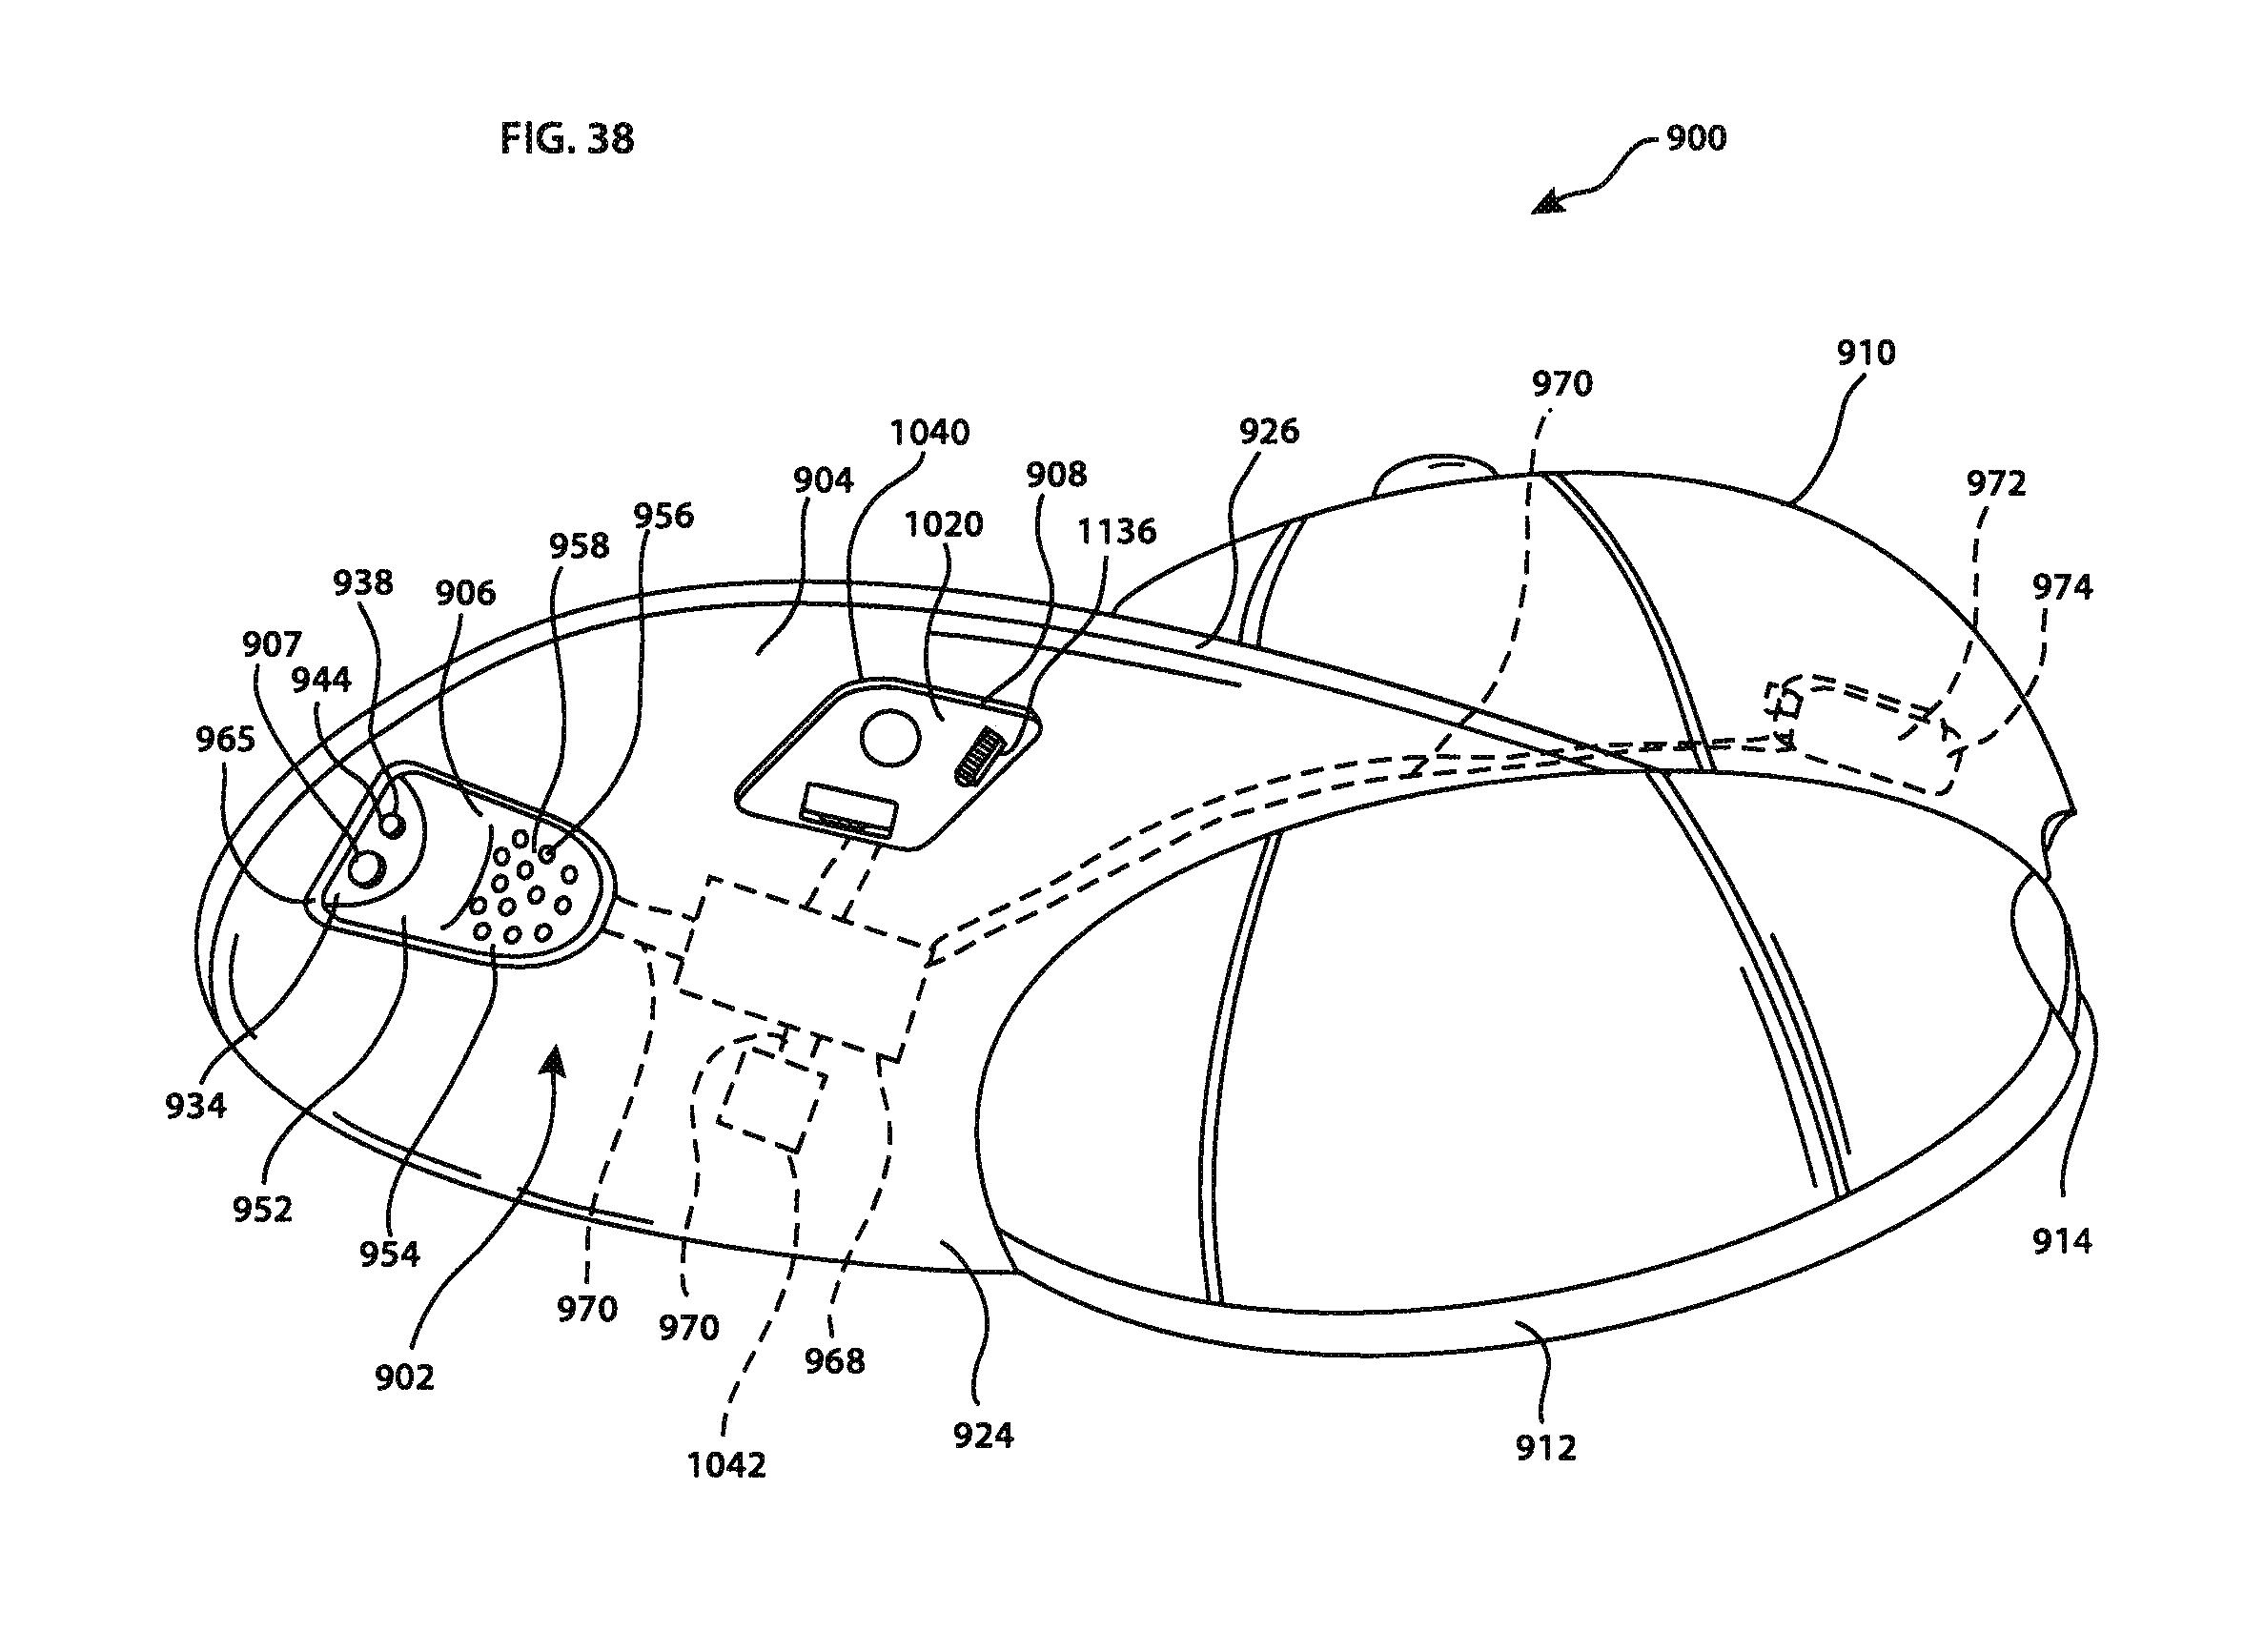 patent us 9 609 902 b2 JVC KD patent images